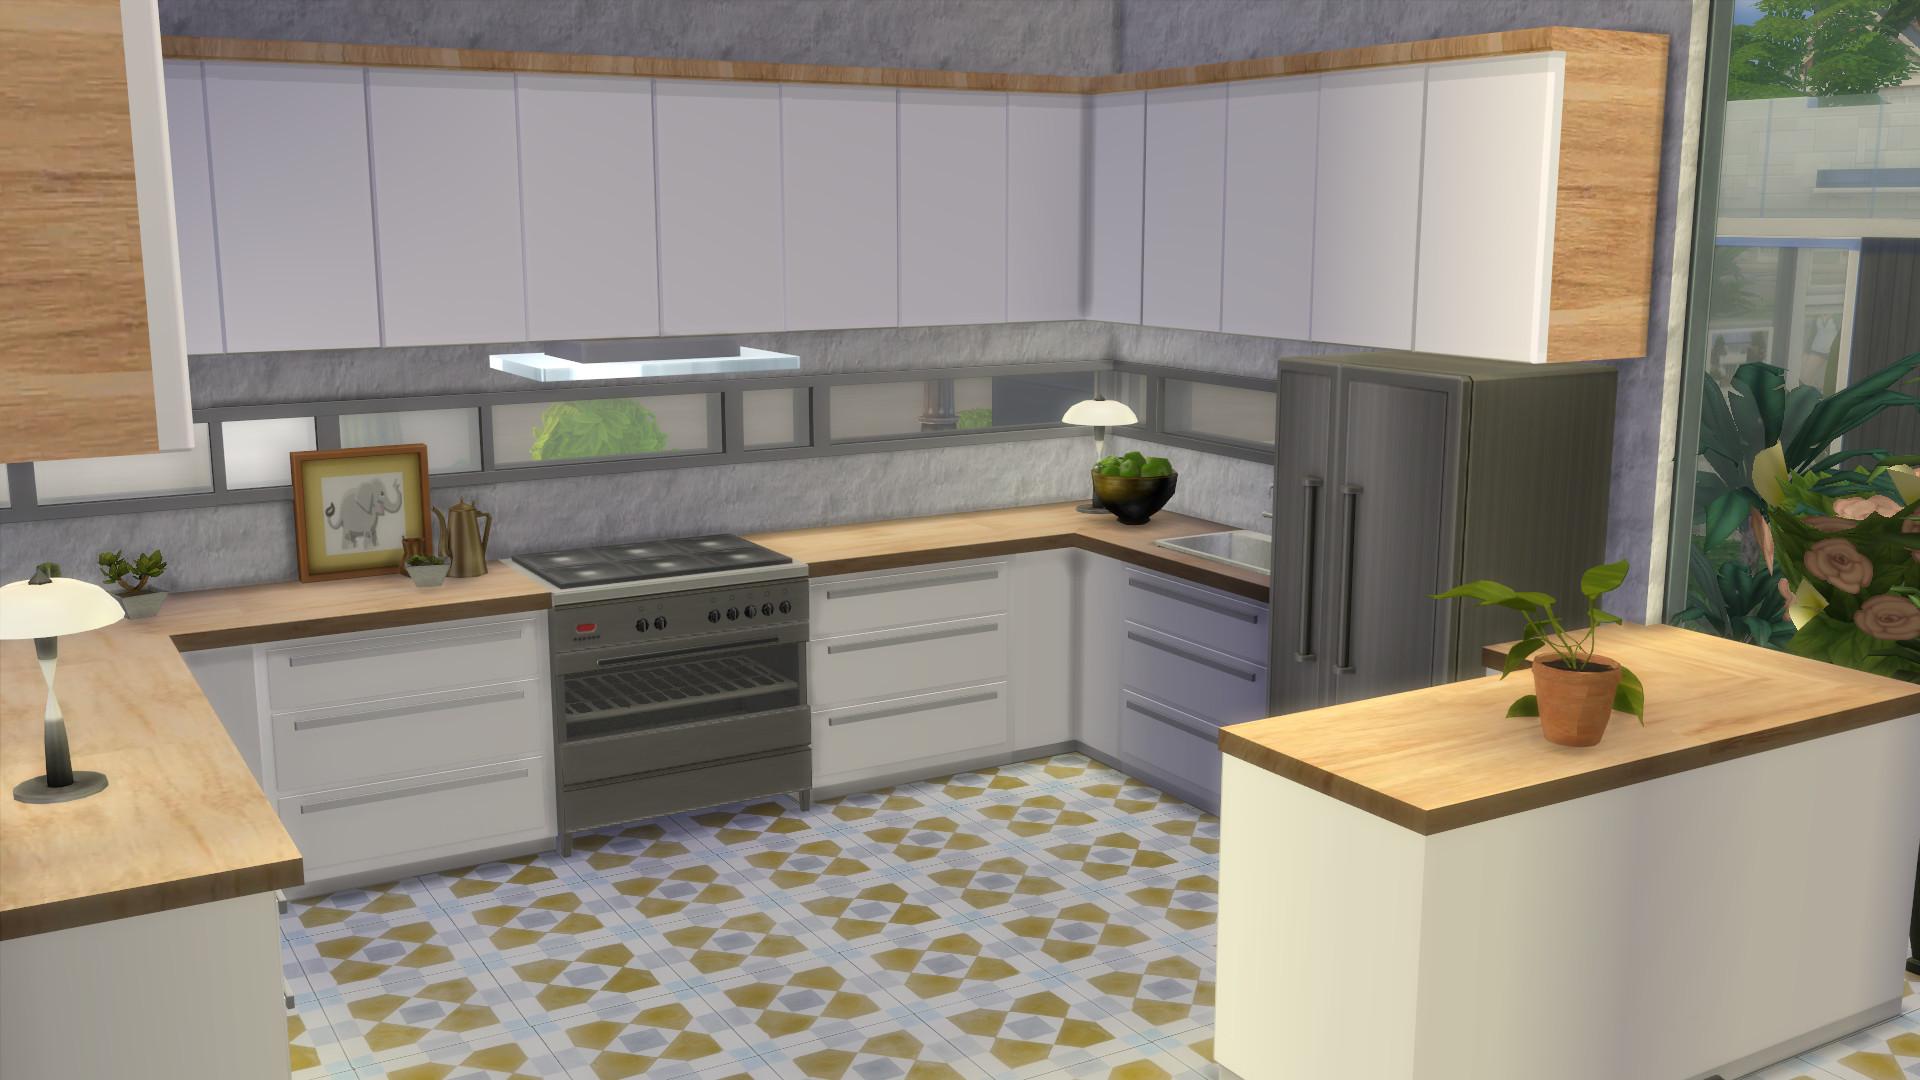 Sims 4 Kitchen Cabinets Cc Baltimore Kitchen Part 2 Updated